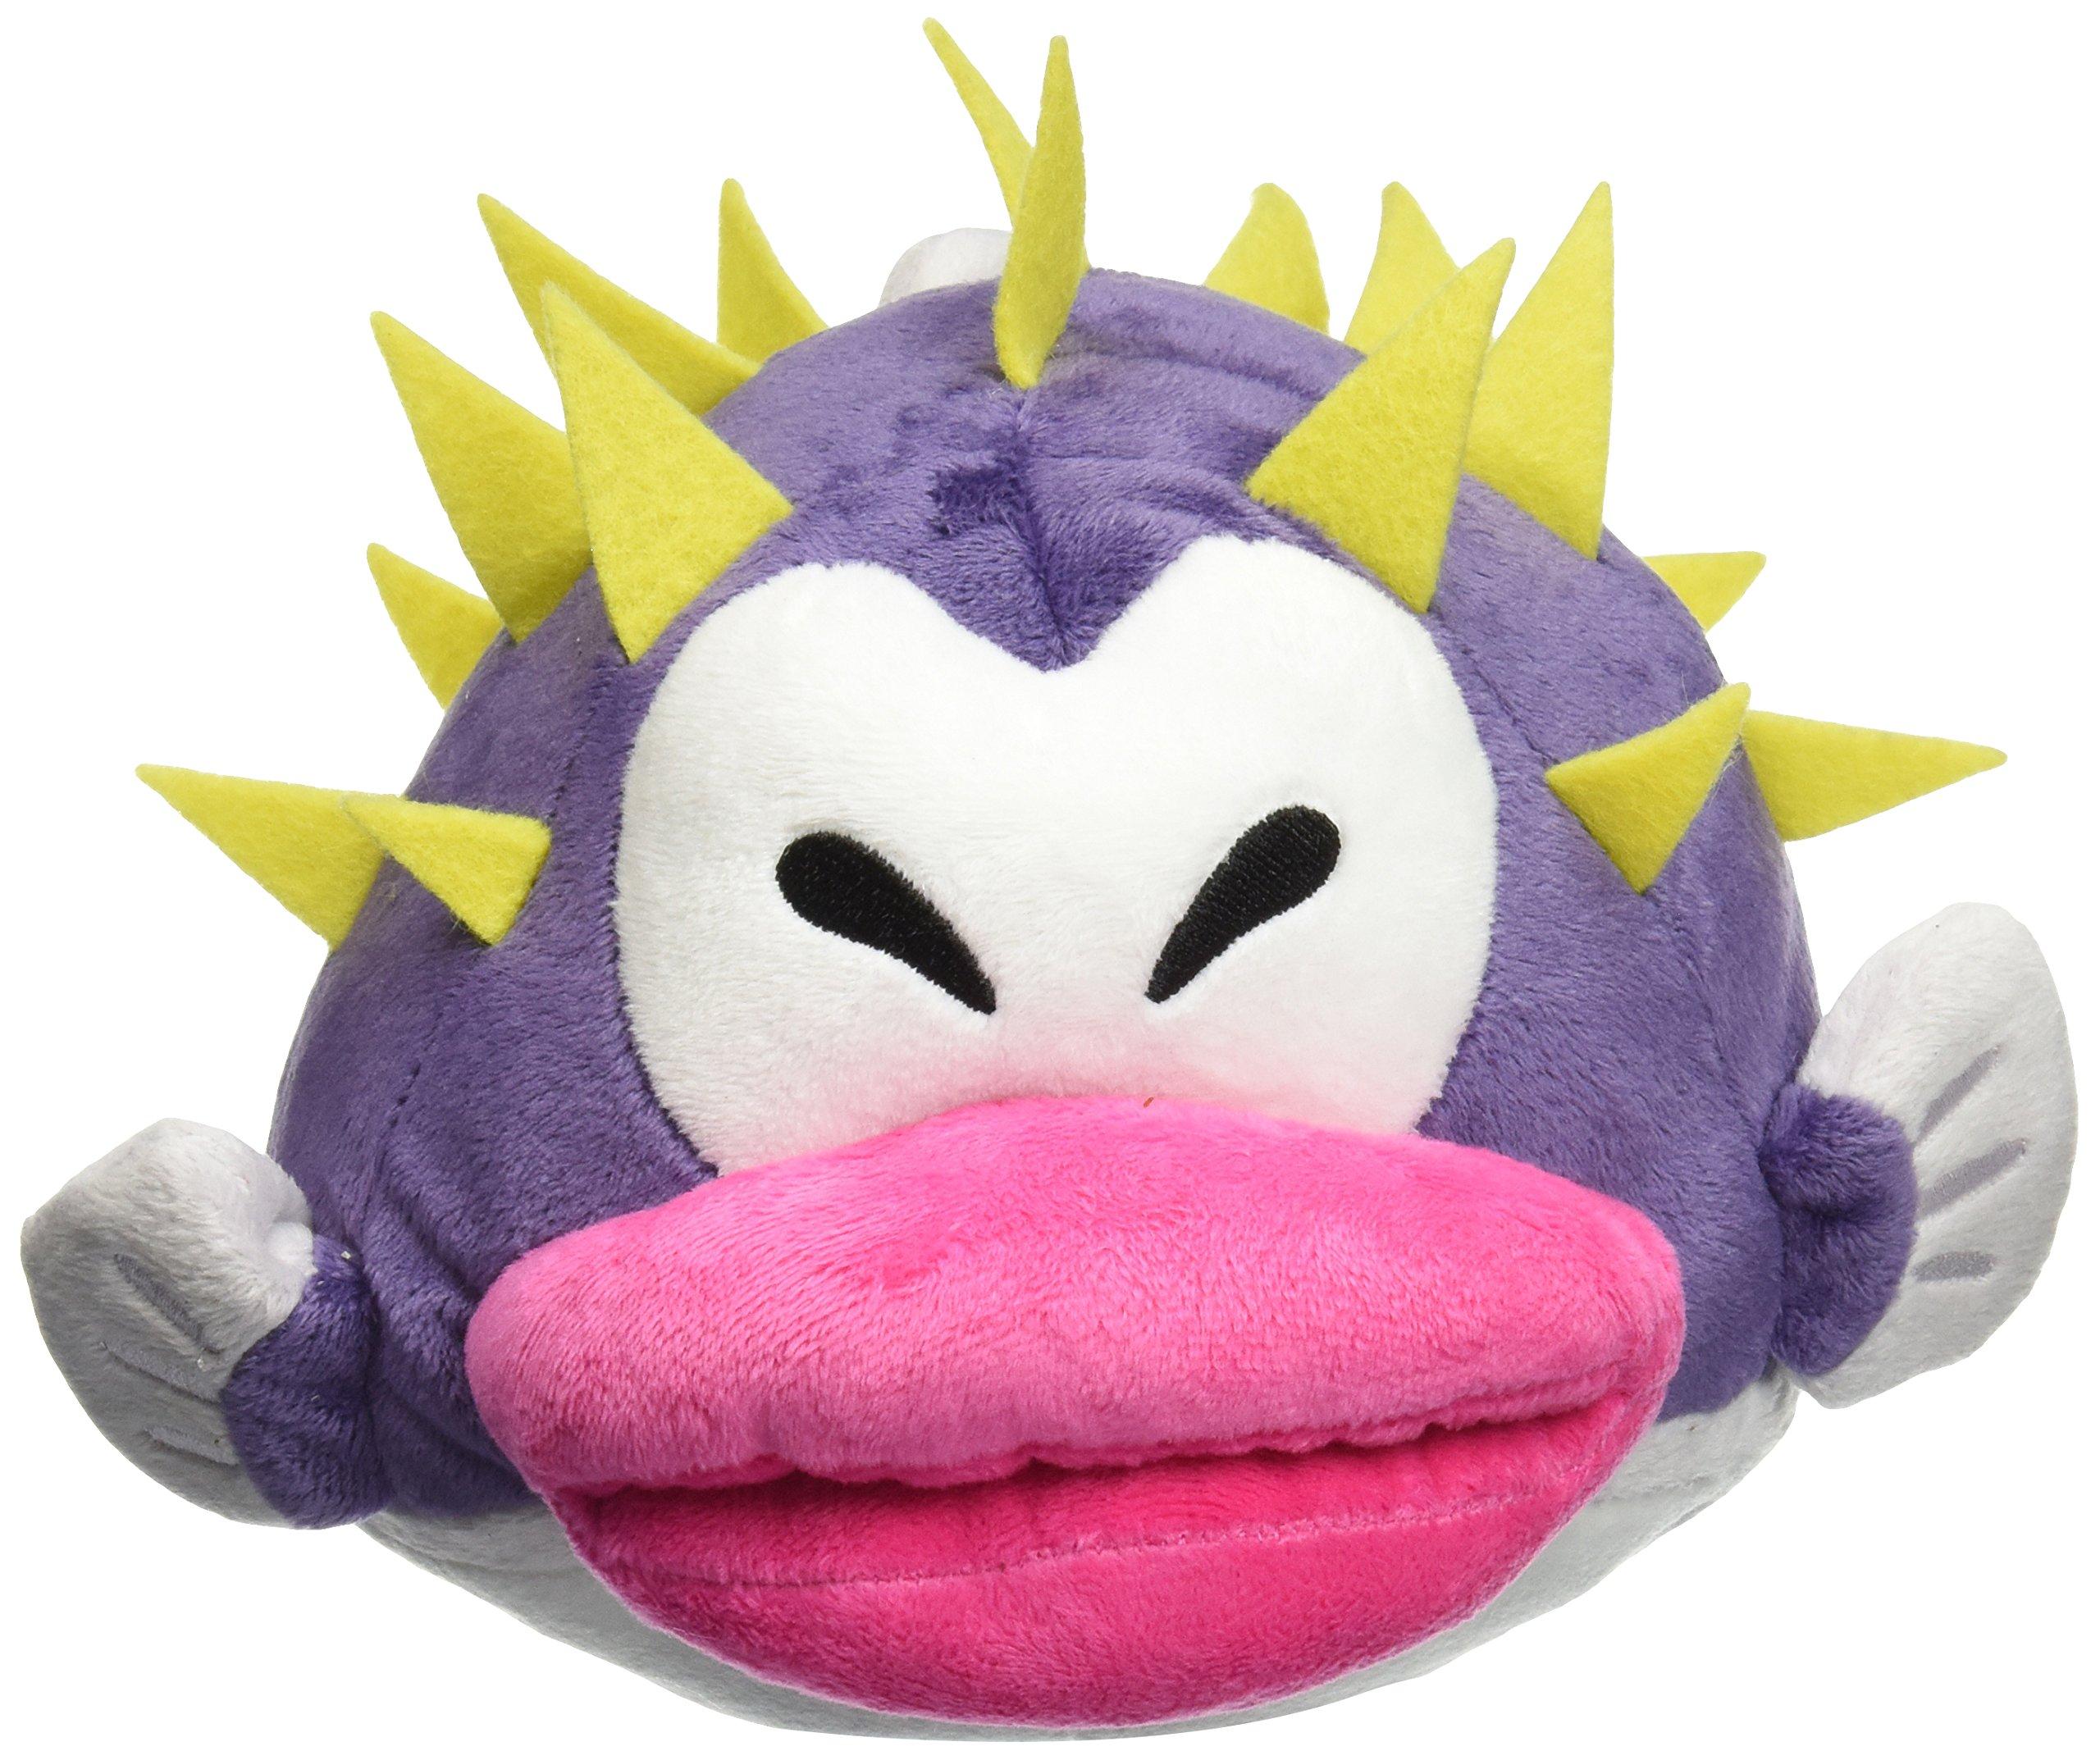 Little Buddy Super Mario Porcupuffer Plush, 7'' by Little Buddy